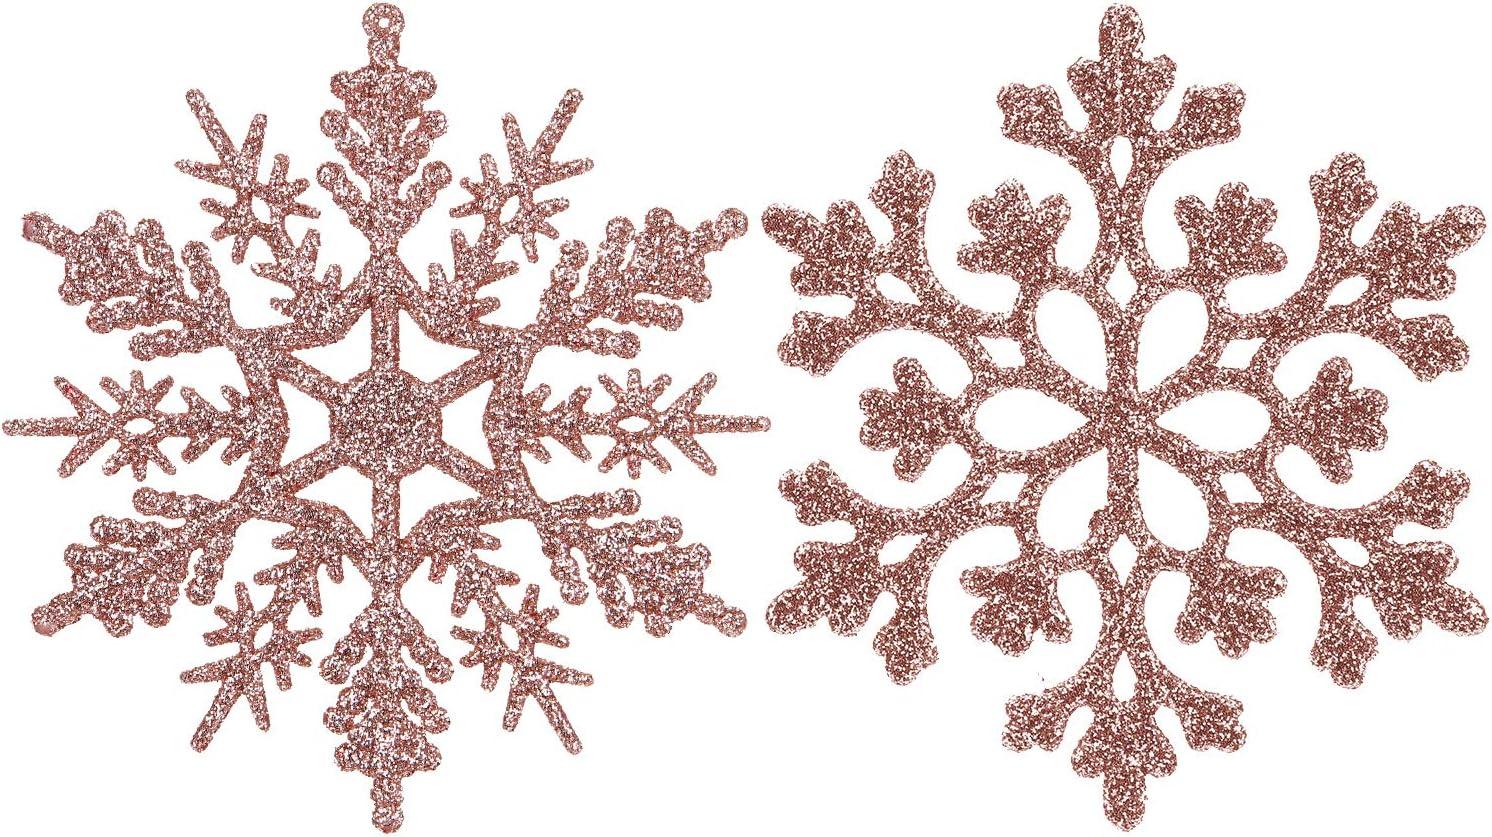 Sea Team Plastic Christmas Glitter Snowflake Ornaments Christmas Tree Decorations, 4-inch, Set of 36, Blush Gold